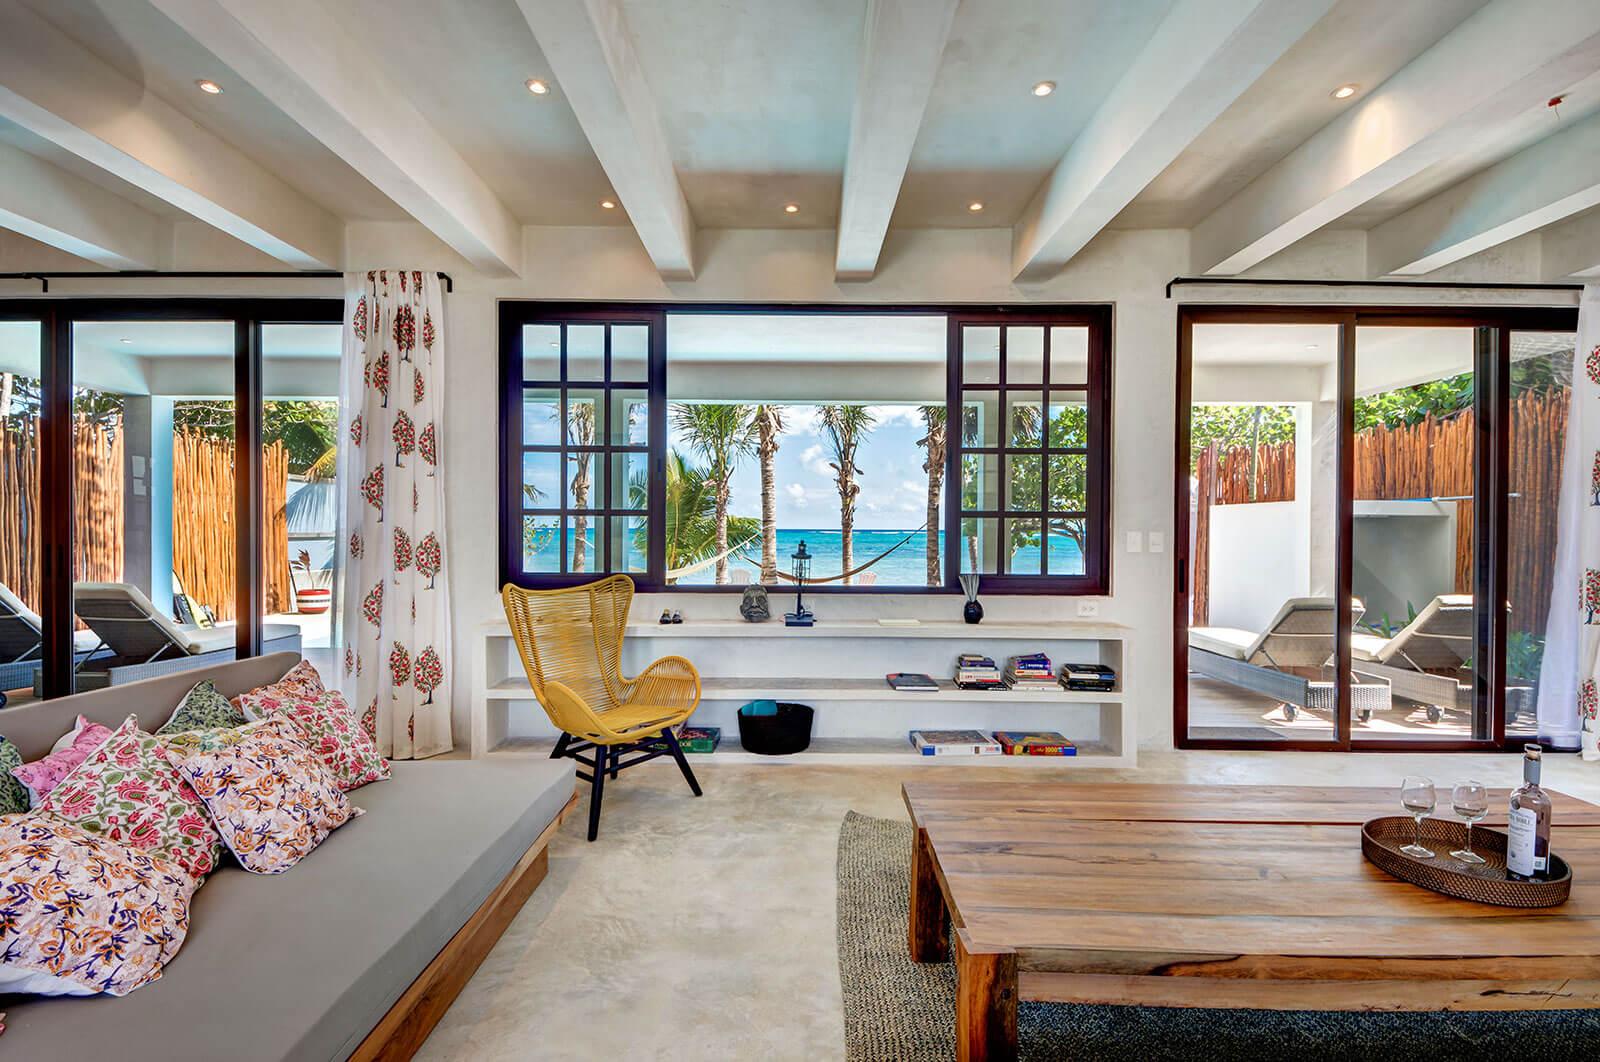 Maya_Luxe_Riviera_Maya_Luxury_Villas_Experiences_Tulum_Soliman_Bay_5_Bedrooms_10.jpg